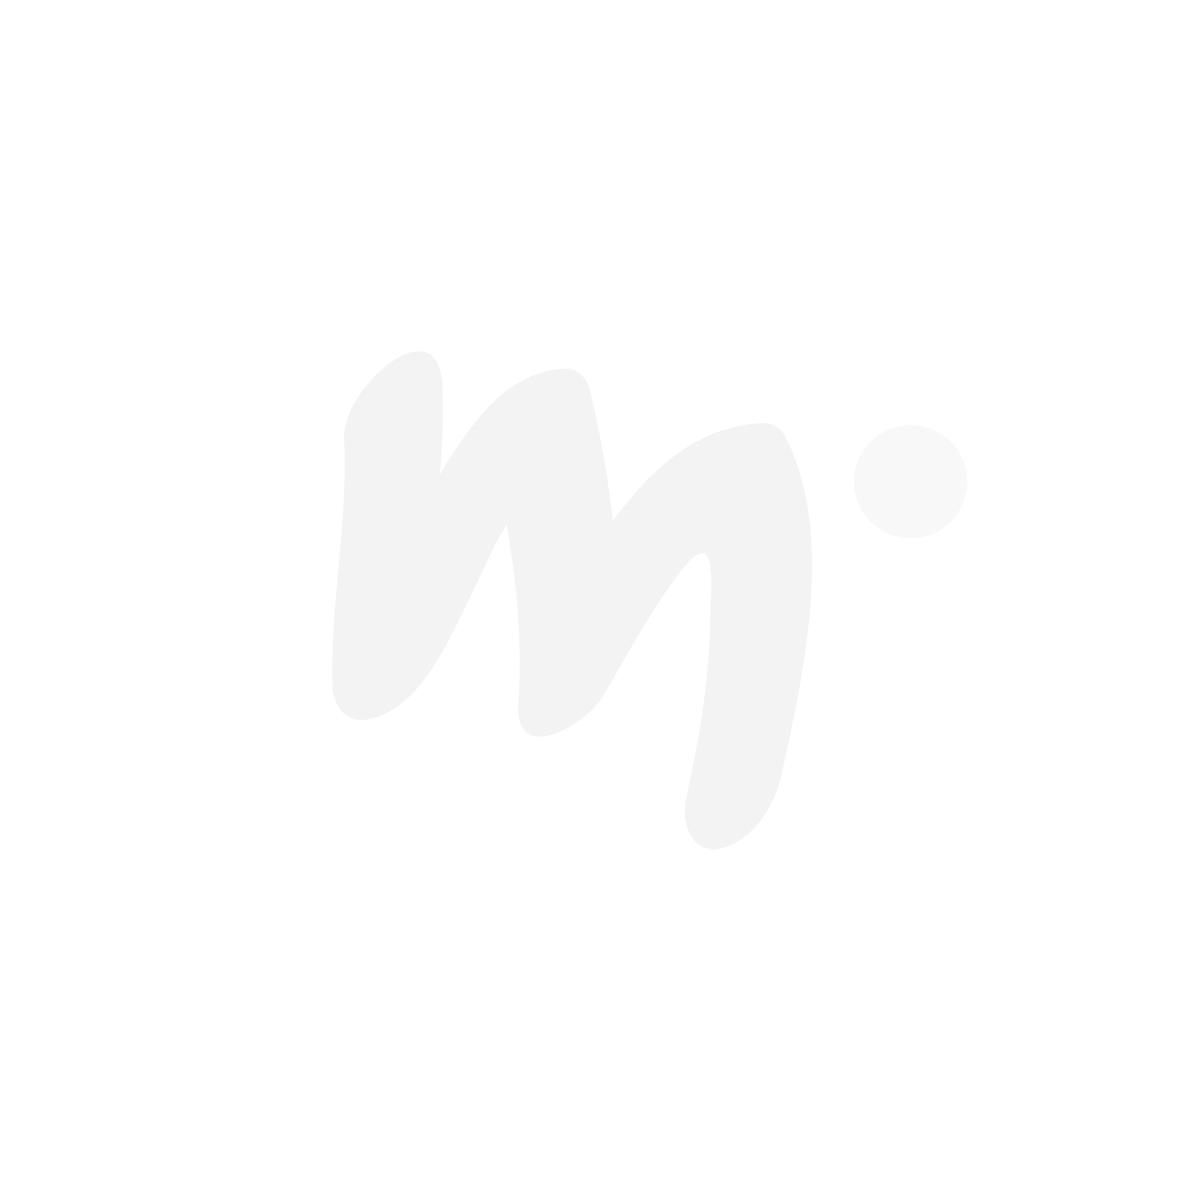 Peppi Pitkätossu Triangelit-tunika